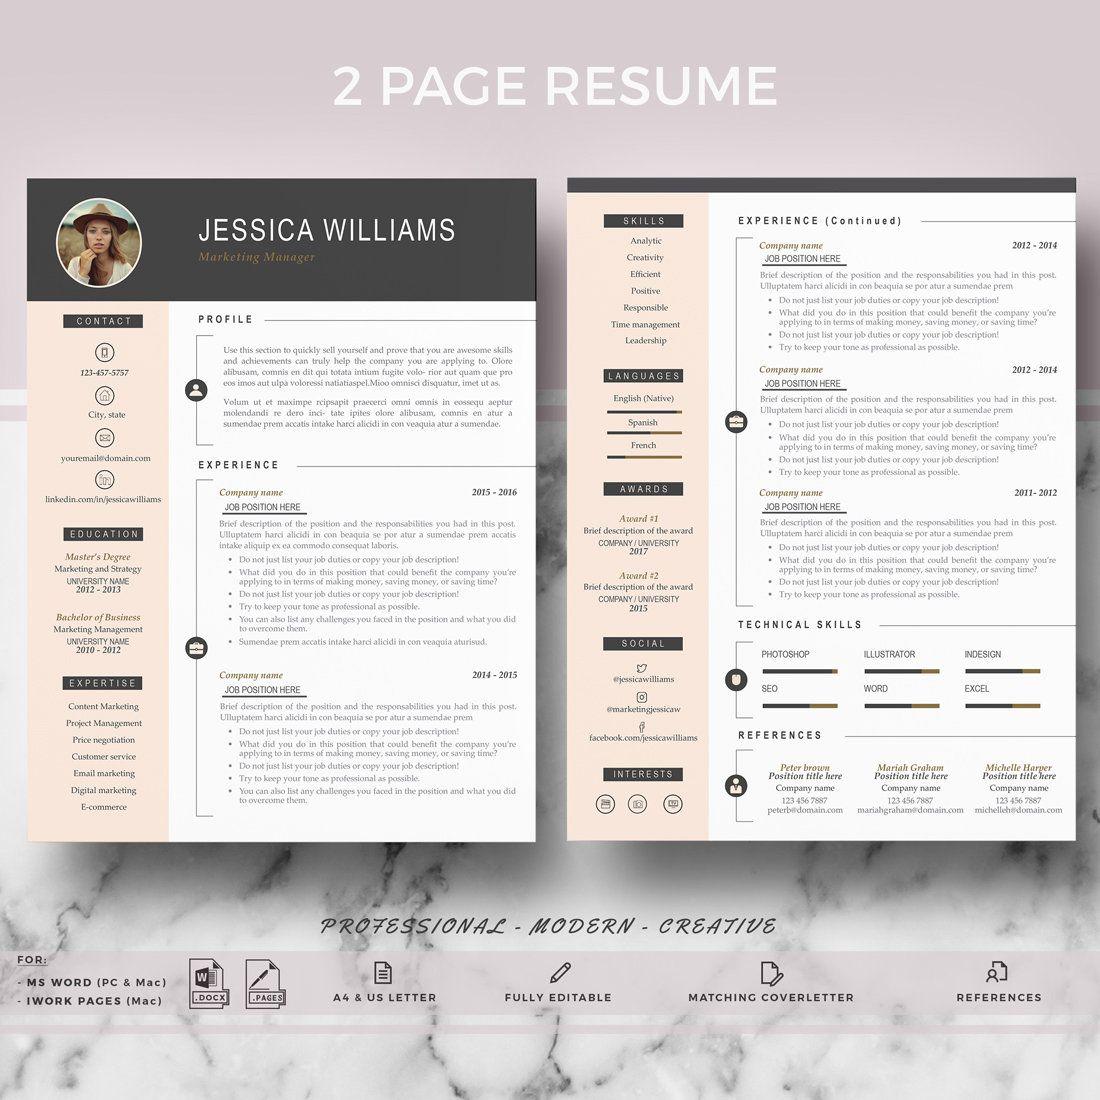 Free Simple Resume Cv Templates Word Format 2020 Resumekraft In 2020 Free Resume Template Download Infographic Resume Template Cv Template Free